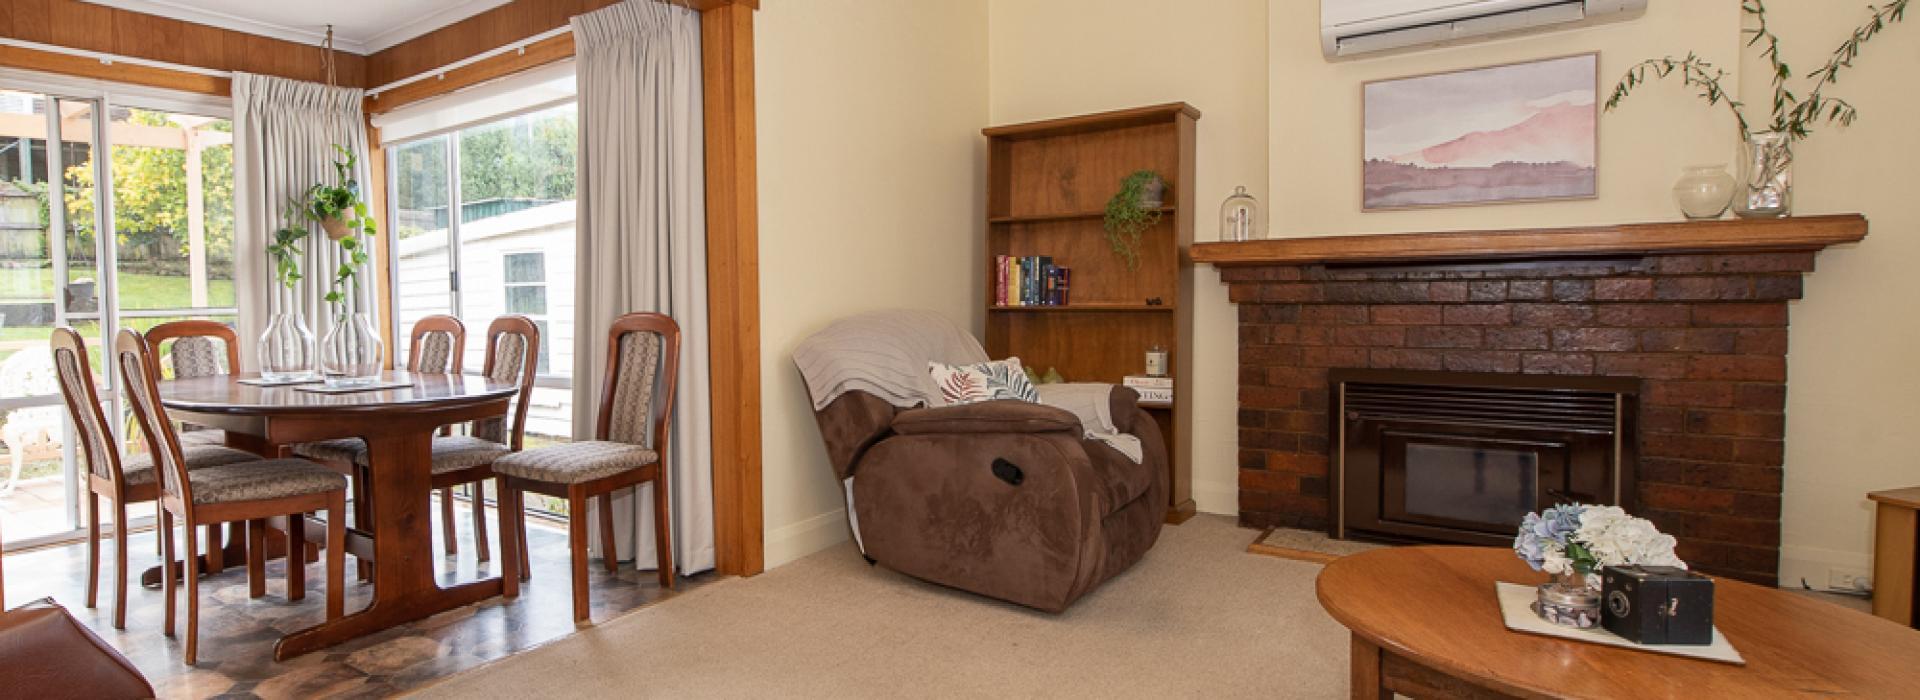 Flanagan Residential | For Sale | Rae Smith | South Launceston